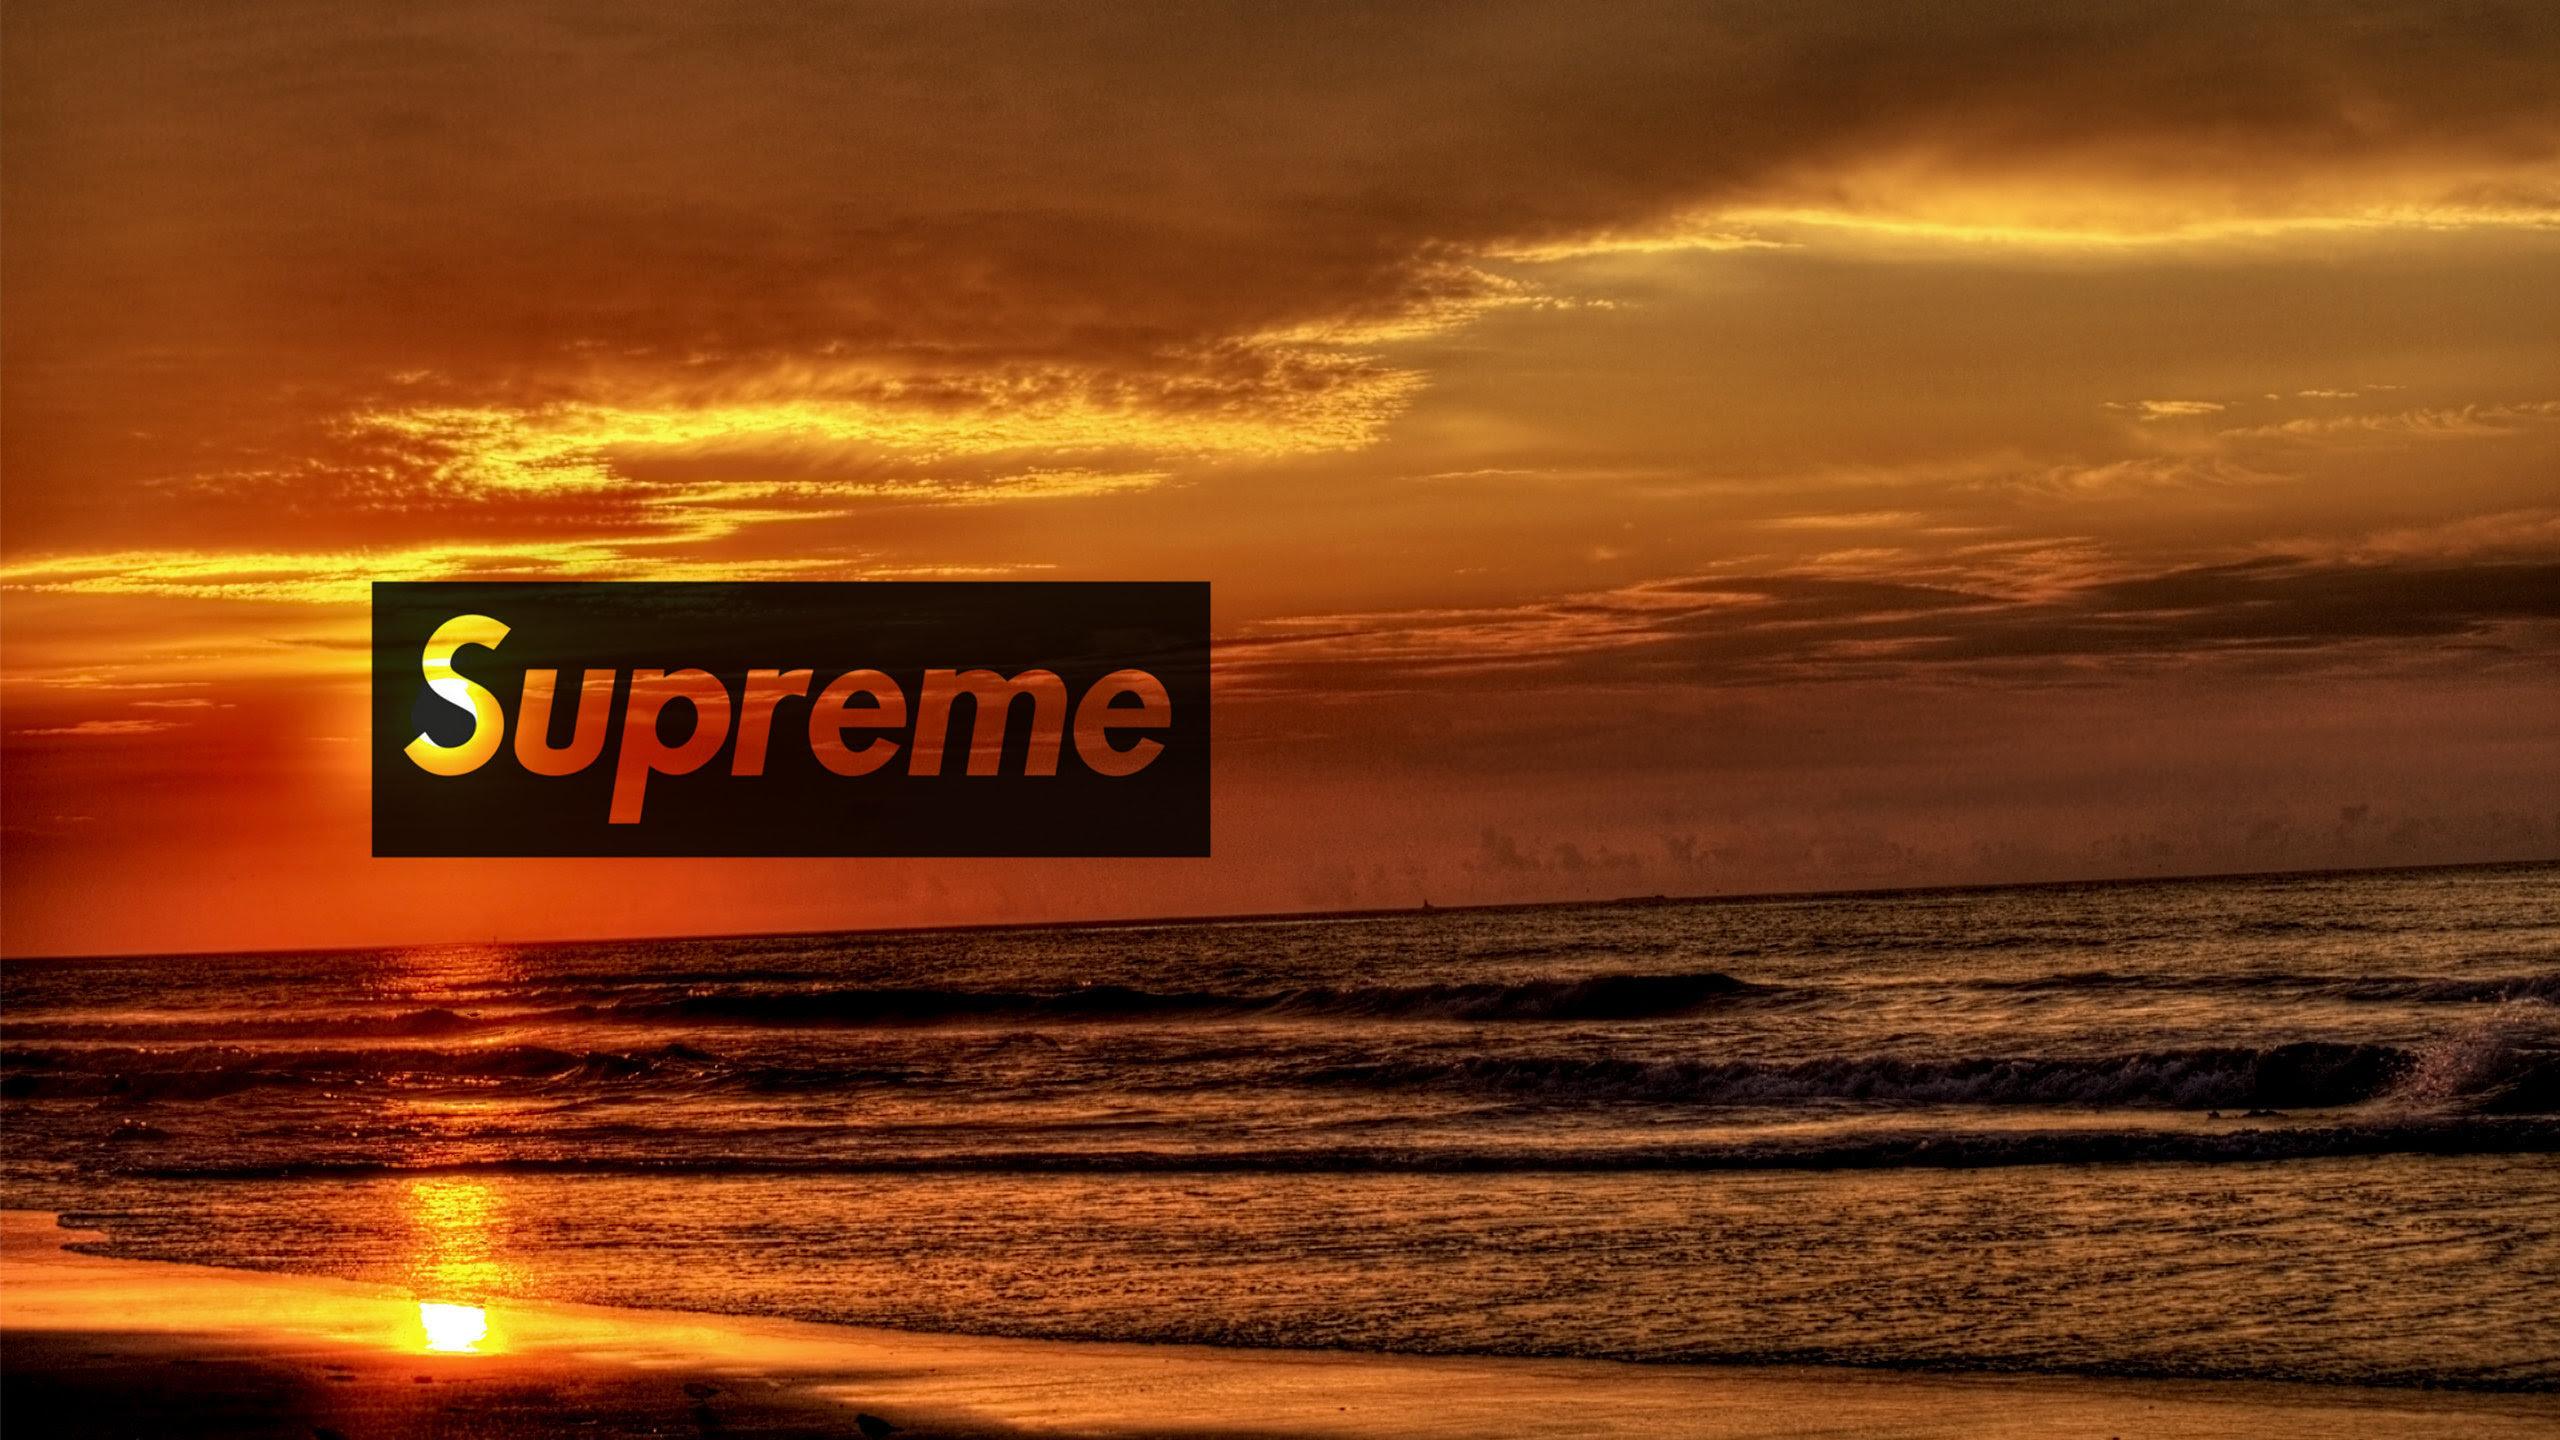 Supreme Sunset Wallpaper - AuthenticSupreme.com